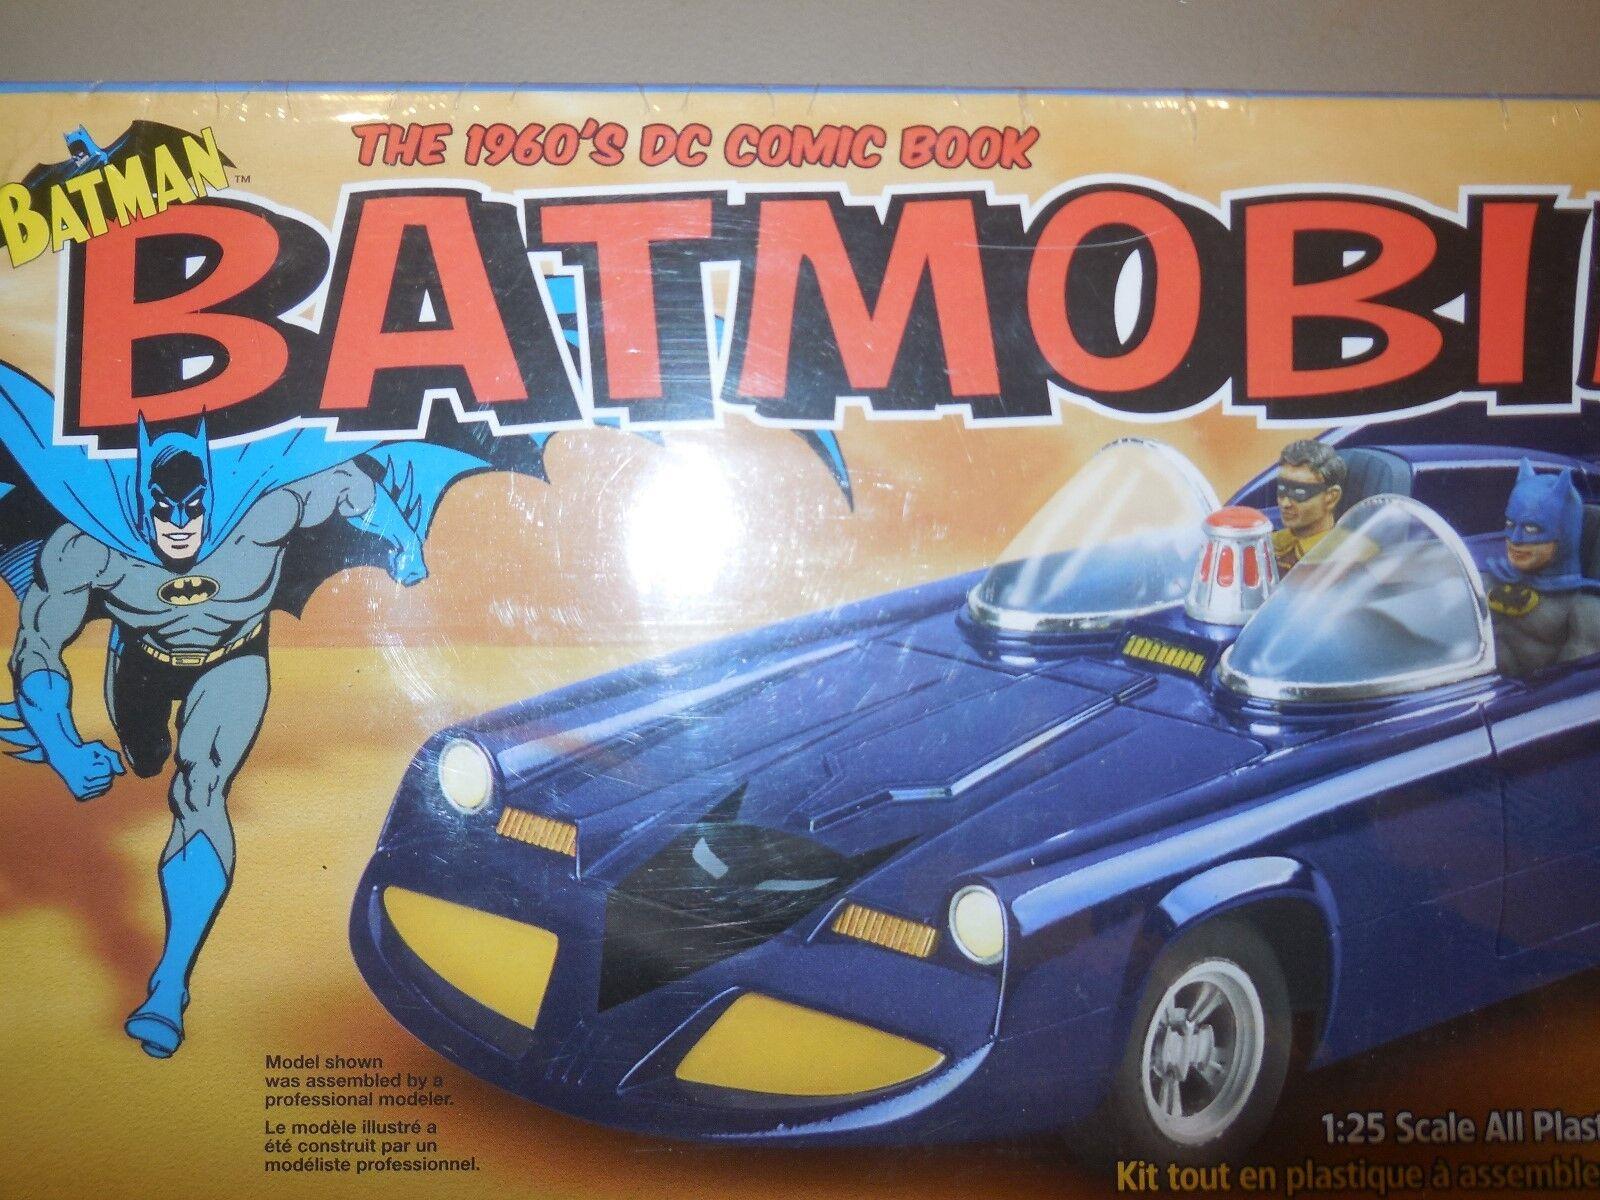 2002 batmobile 110 precision pieces model kit by polar lights